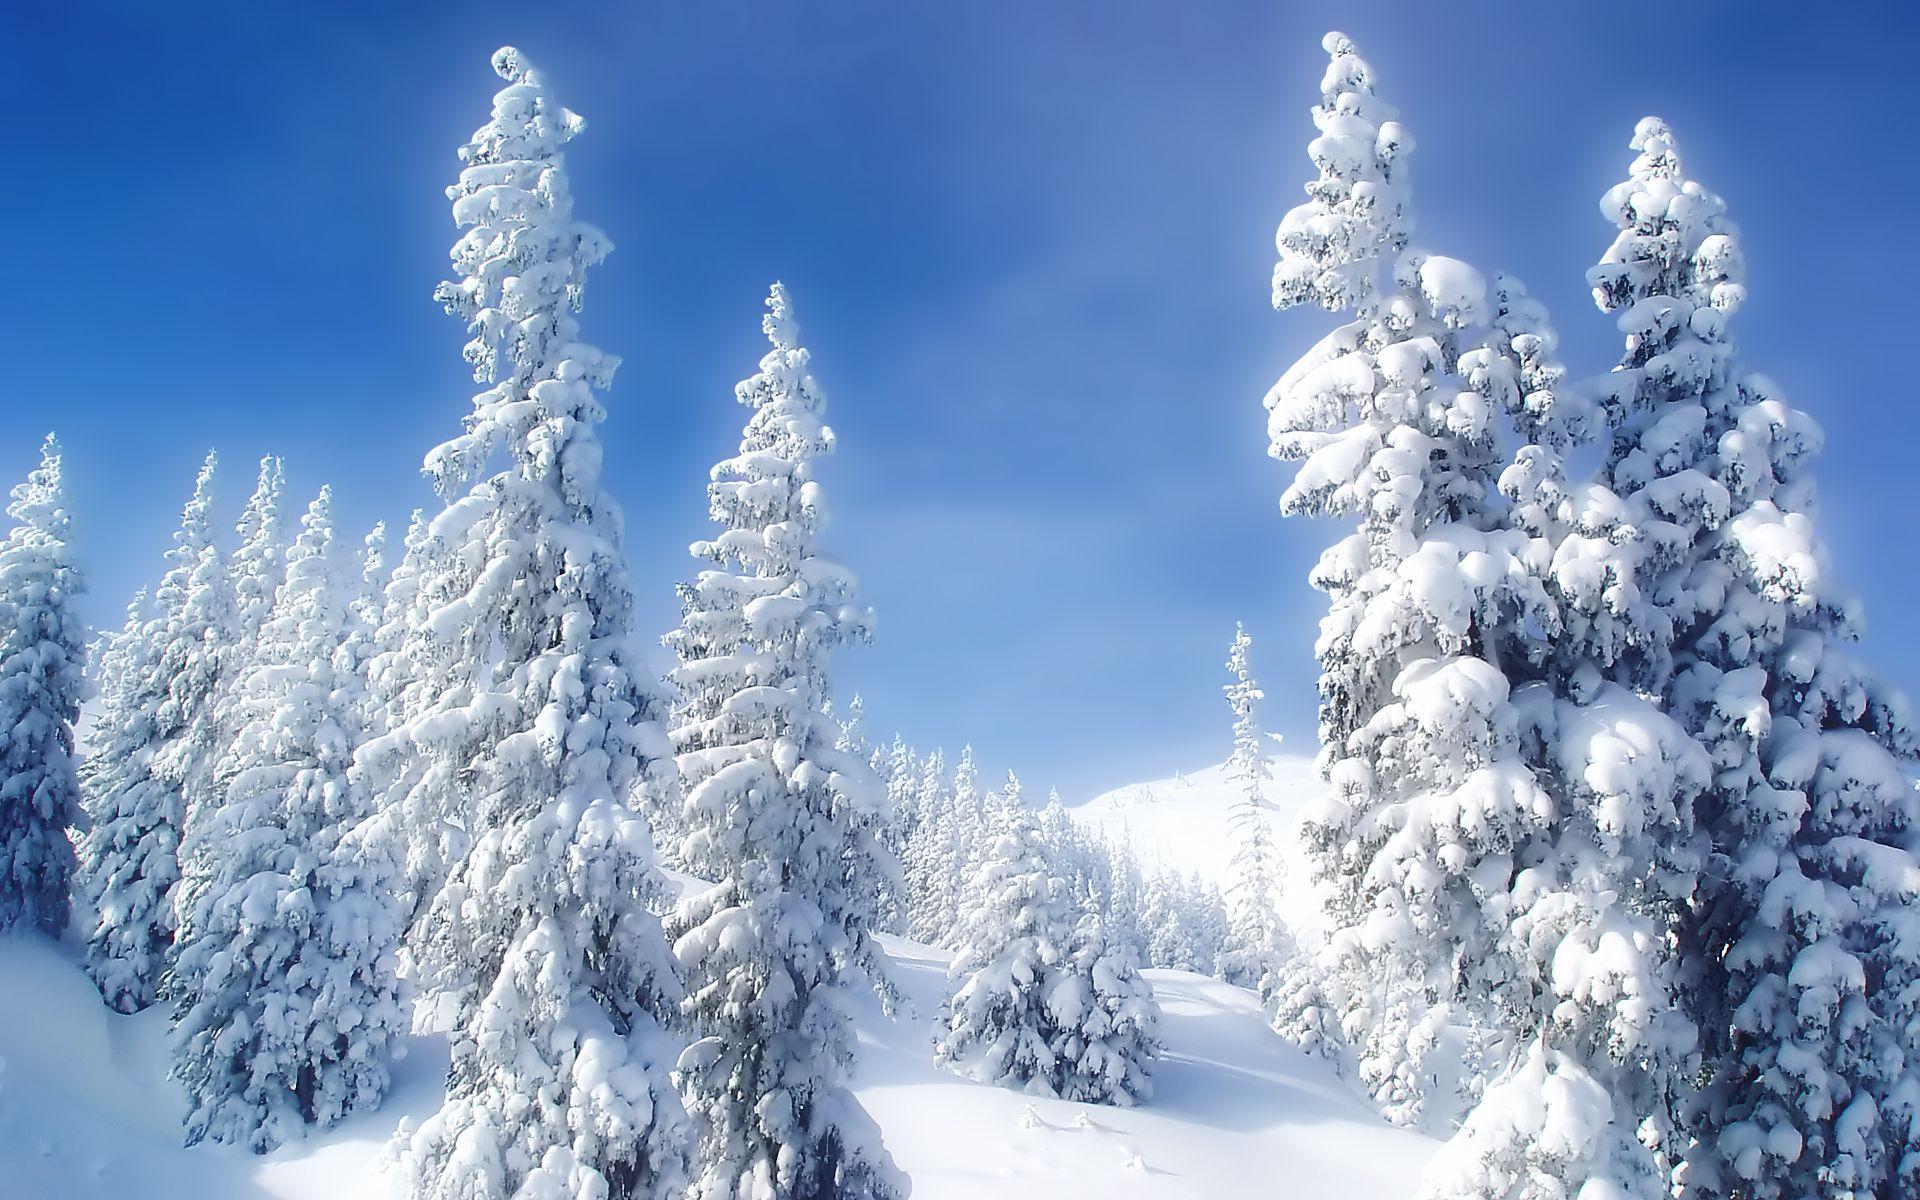 Winter Wonderland Christmas Wallpaper Hd